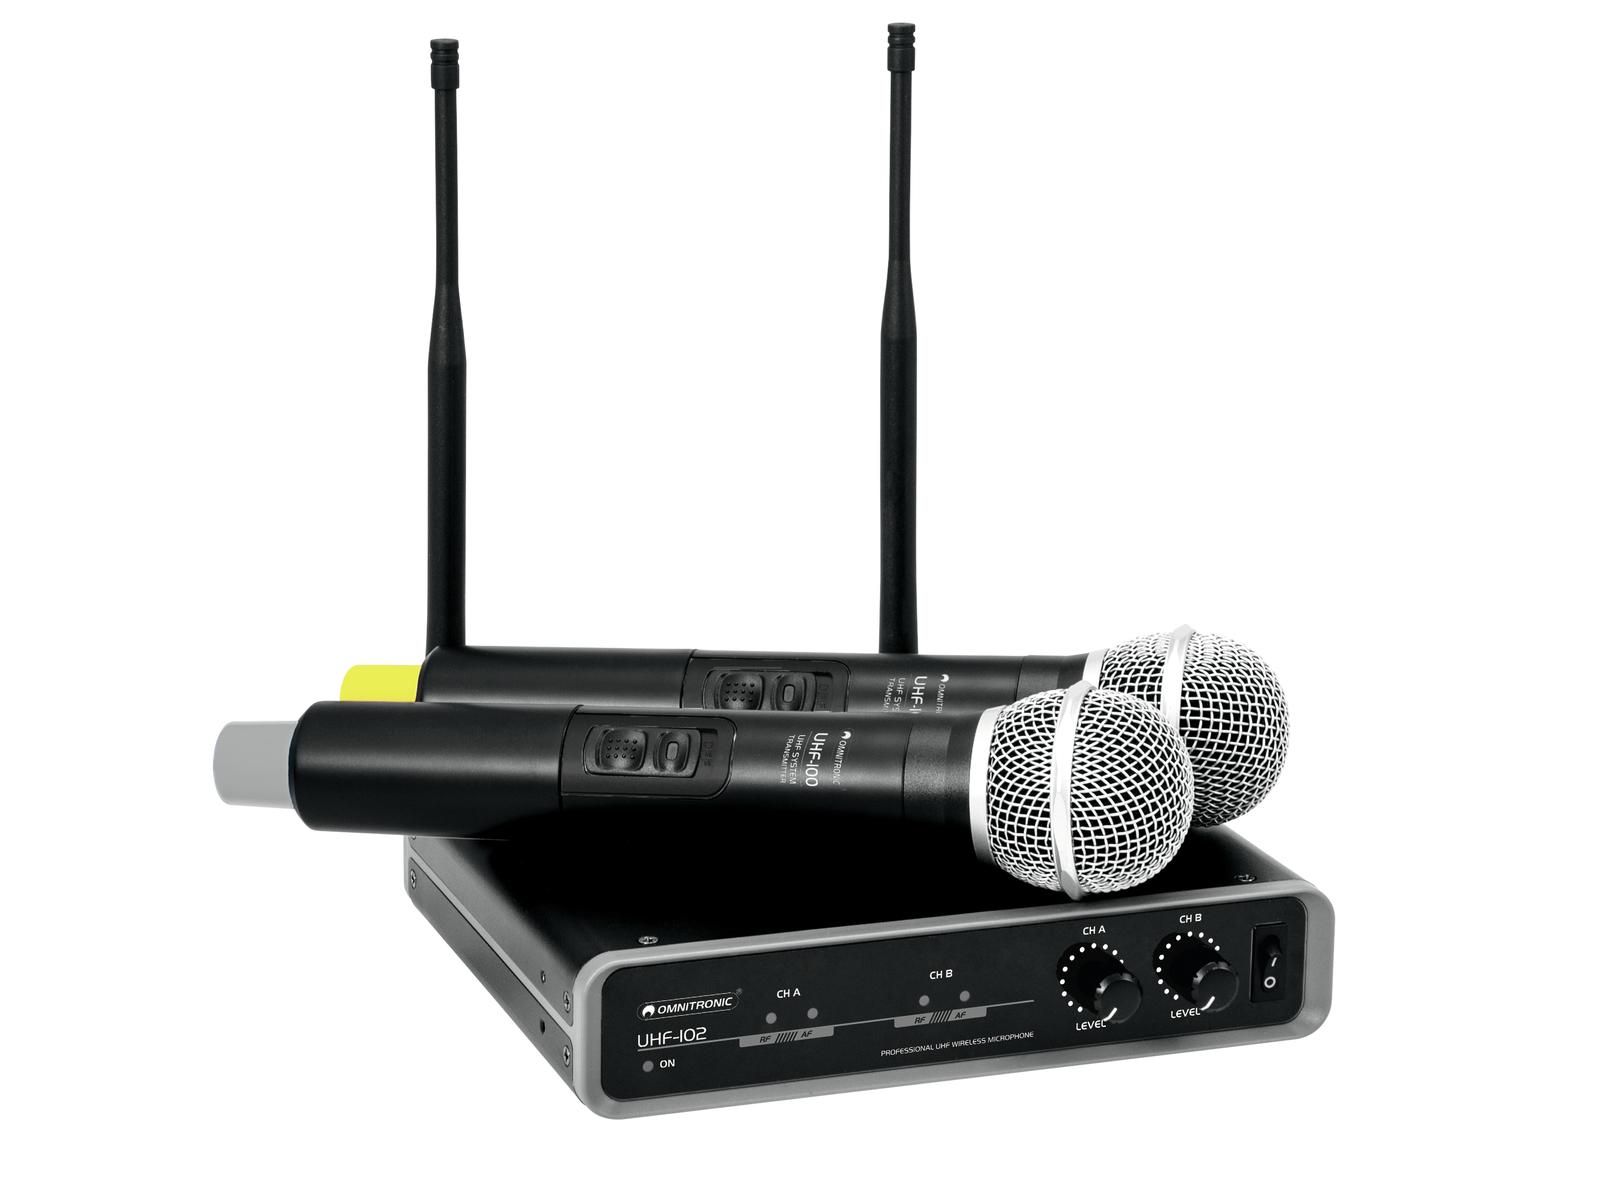 OMNITRONIC UHF-102 Mic senza f